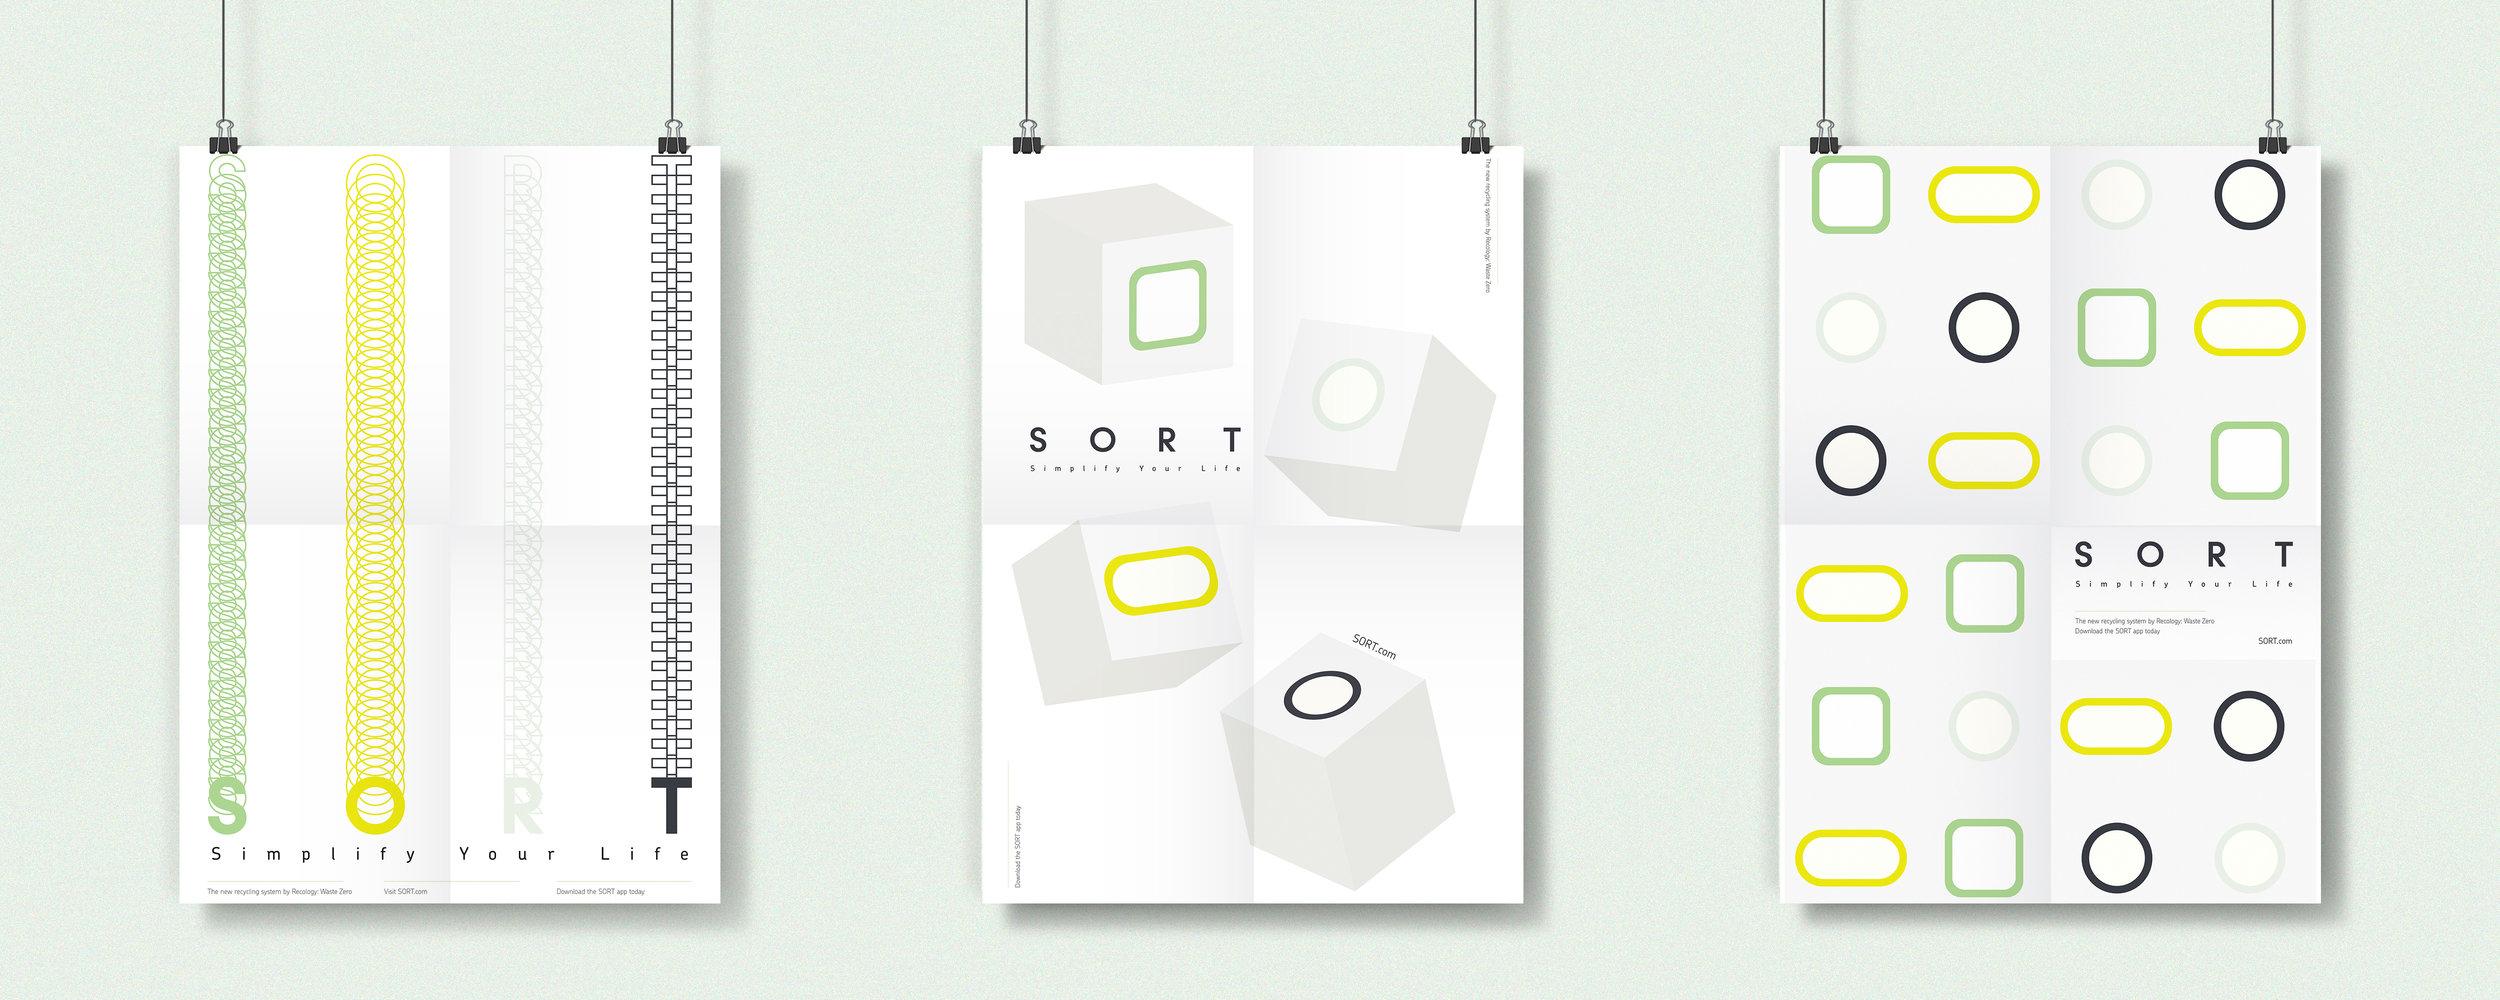 Sort Promo Posters Mockup.jpg